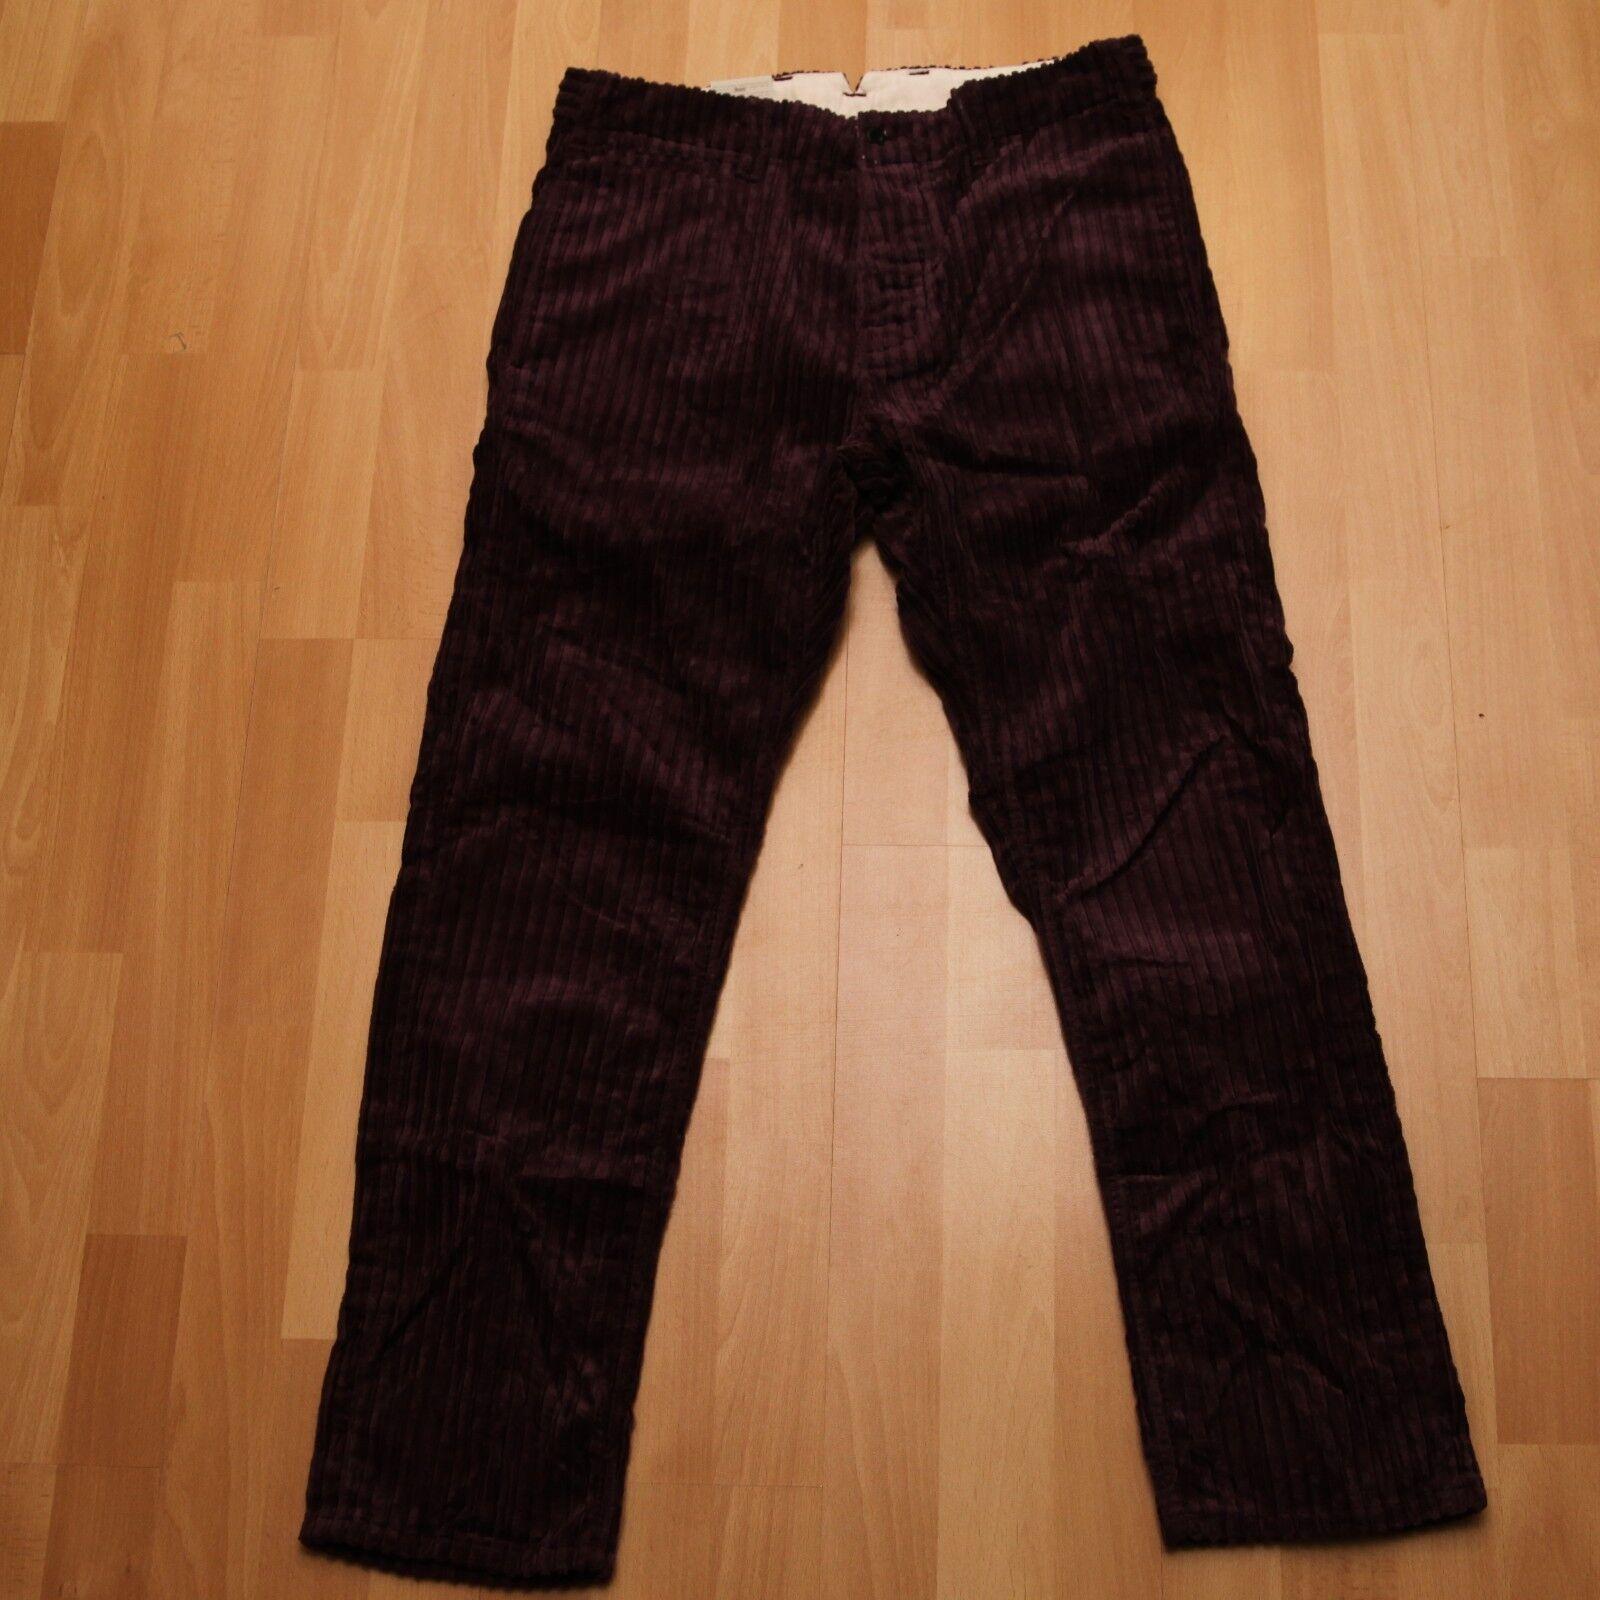 NUOVO Nudie Jeans, regular Anton (Regular Straight Leg) wide Plum Cord 32 30